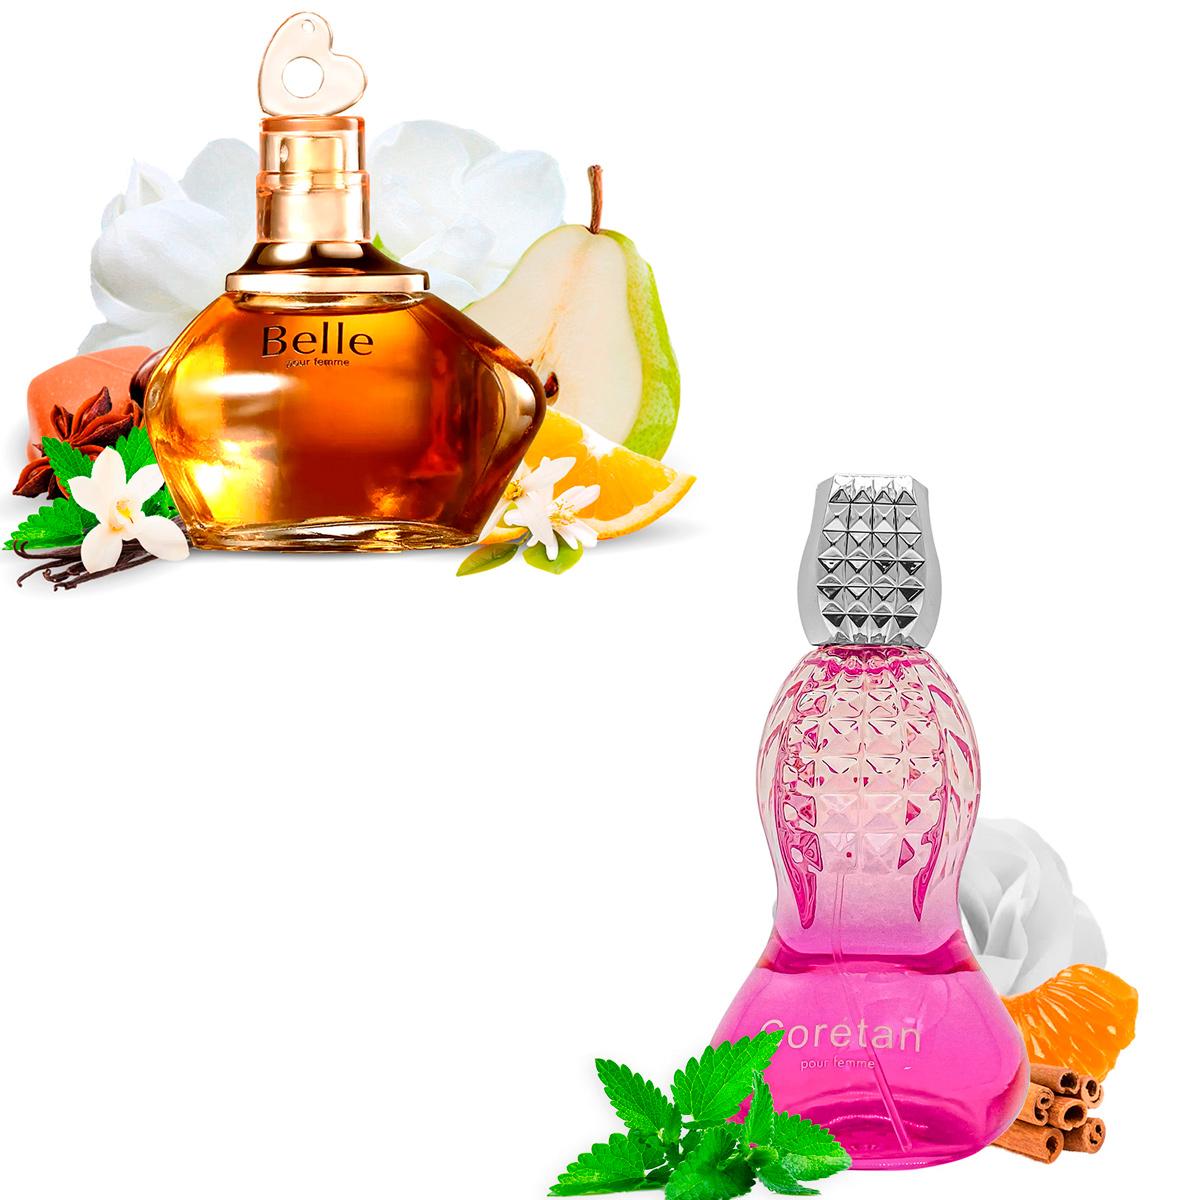 Kit 2 Perfumes Importados Belle e Coretan I Scents